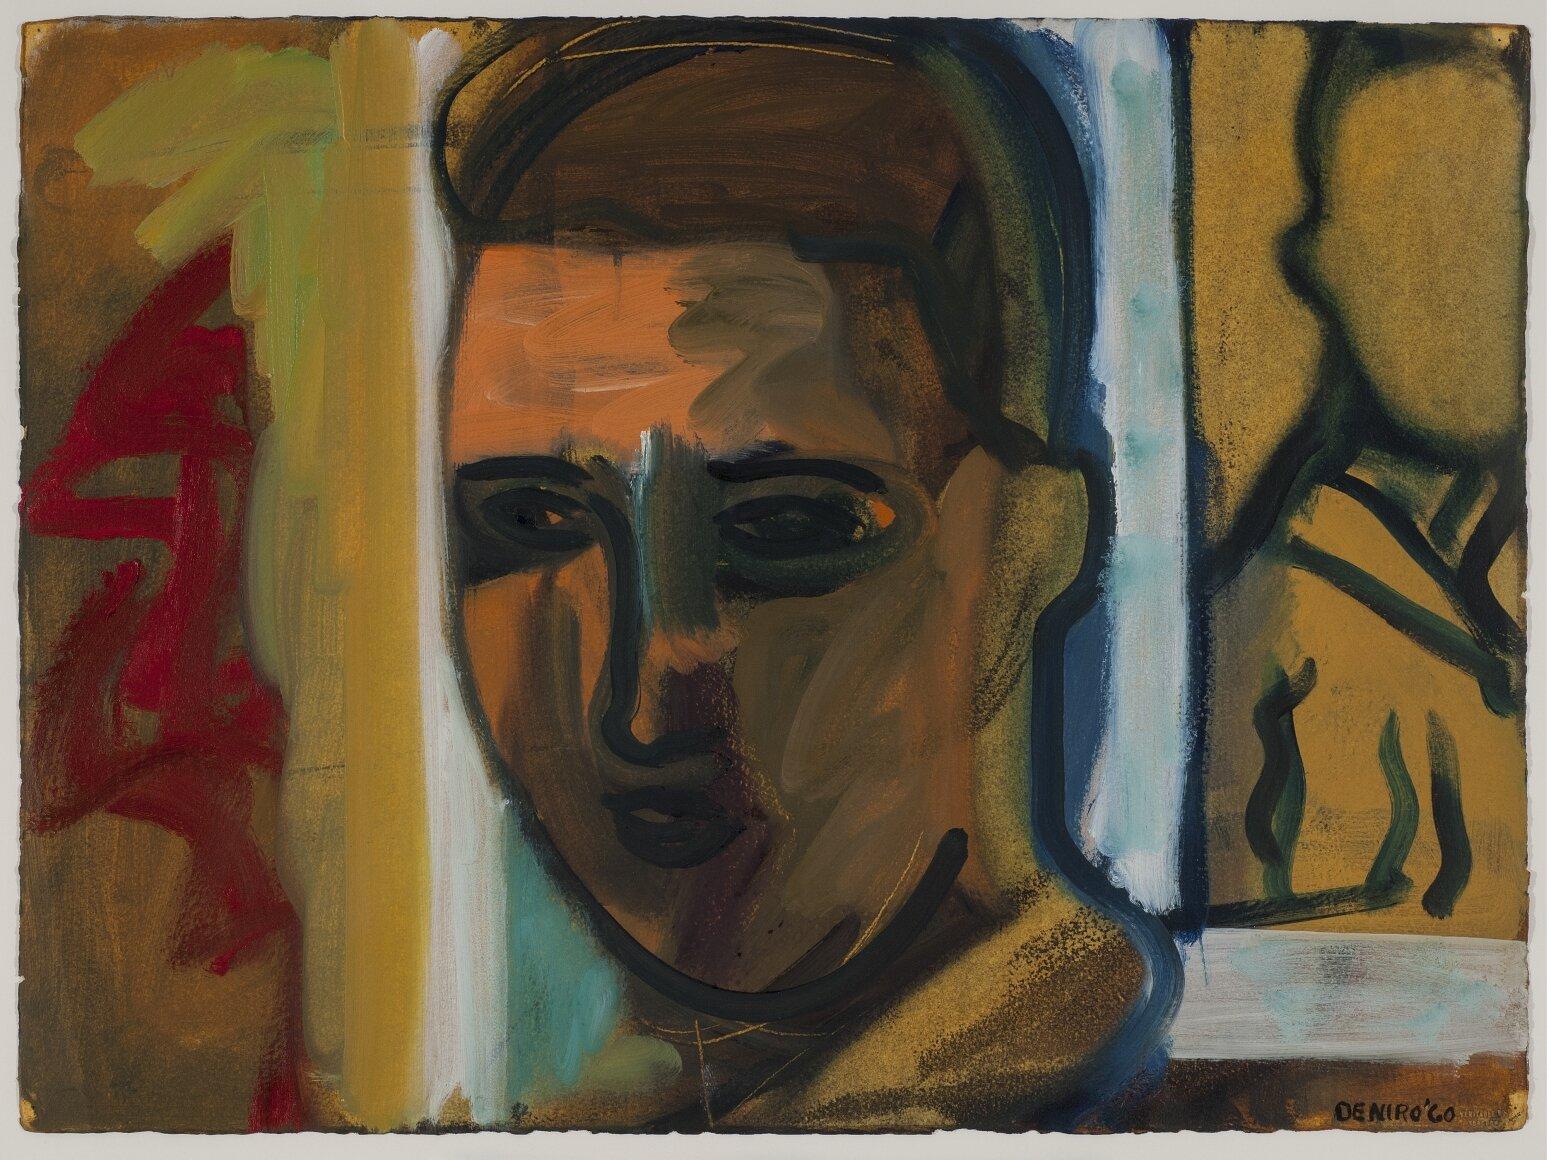 Self Portrait , 1960, Oil on paper, 22 1/4 x 30 1/4 inches